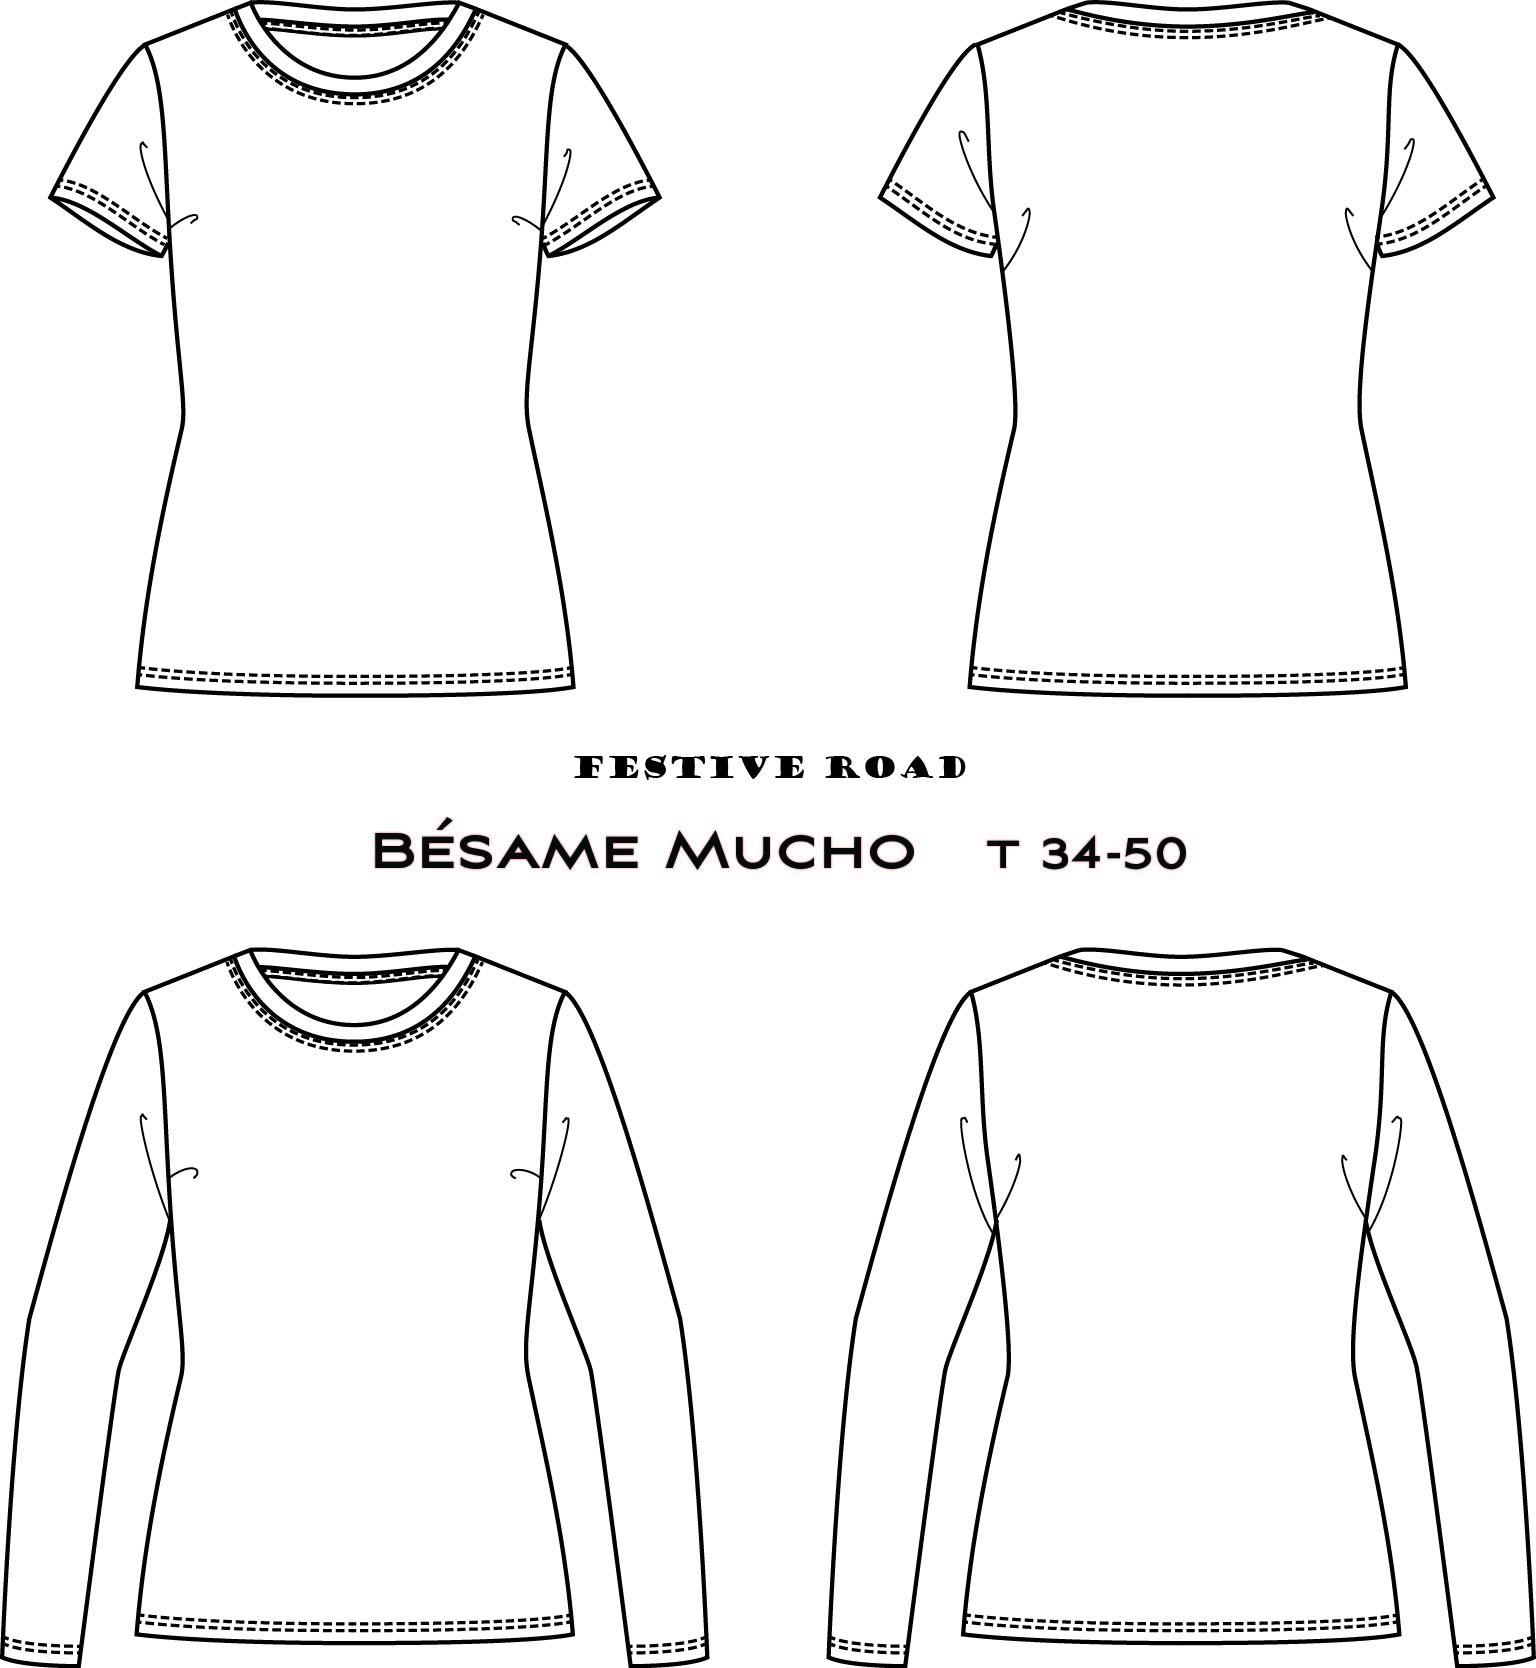 patron gratuit de t-shirt Beasame Mucho